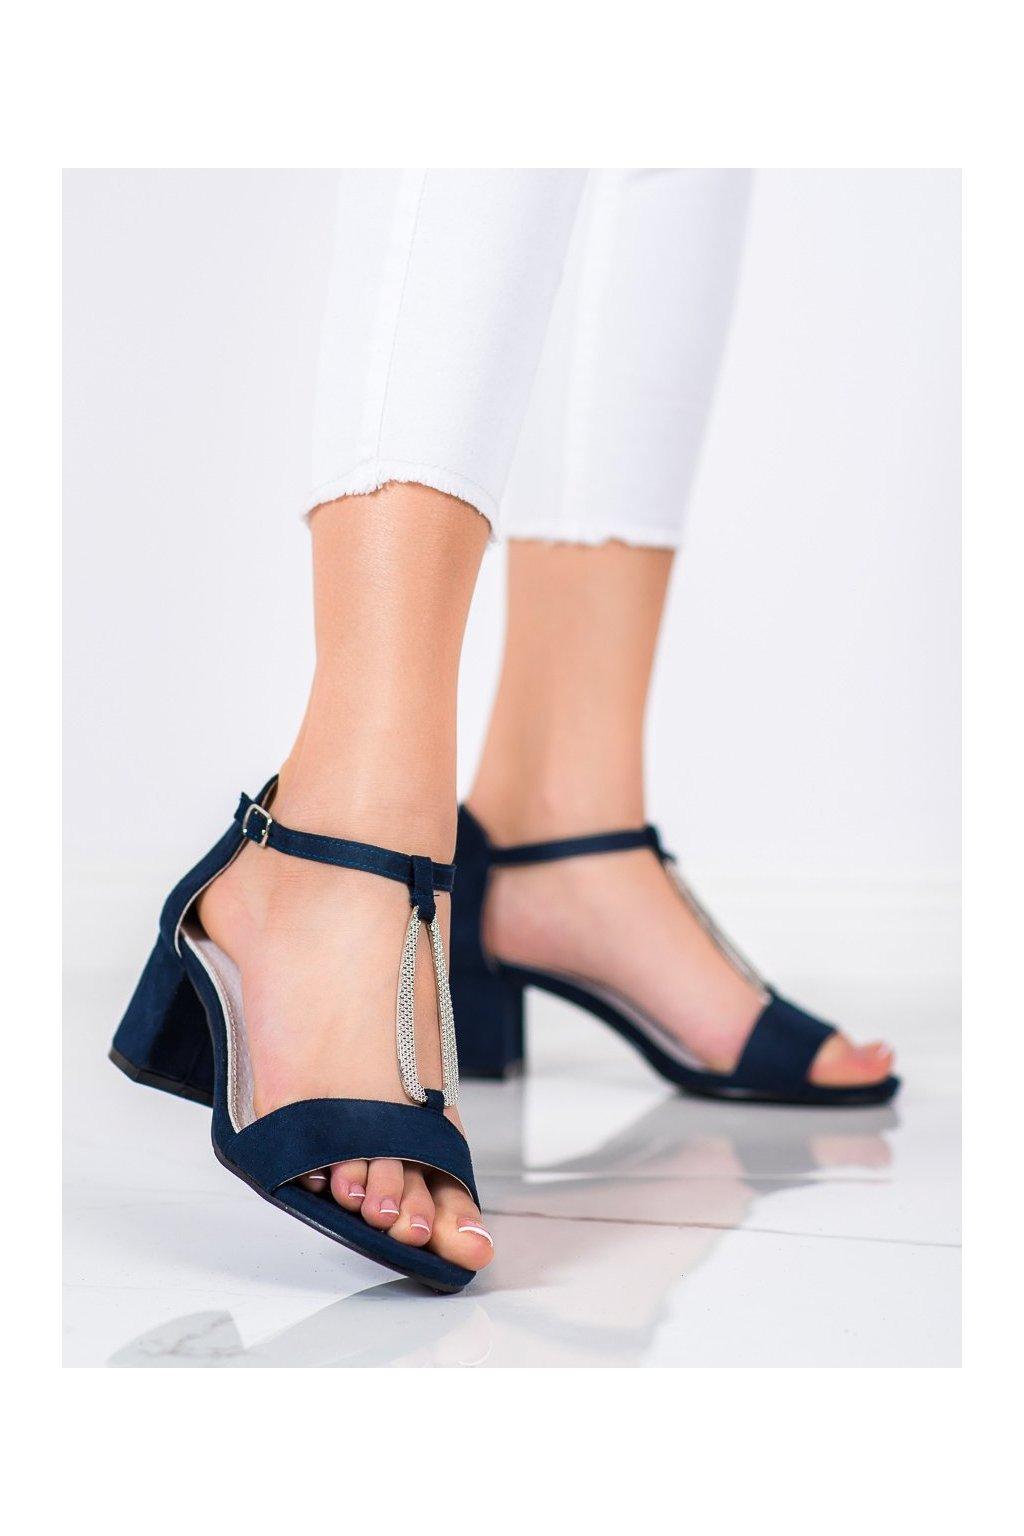 Modré sandále Goodin kod GD-FL1027N